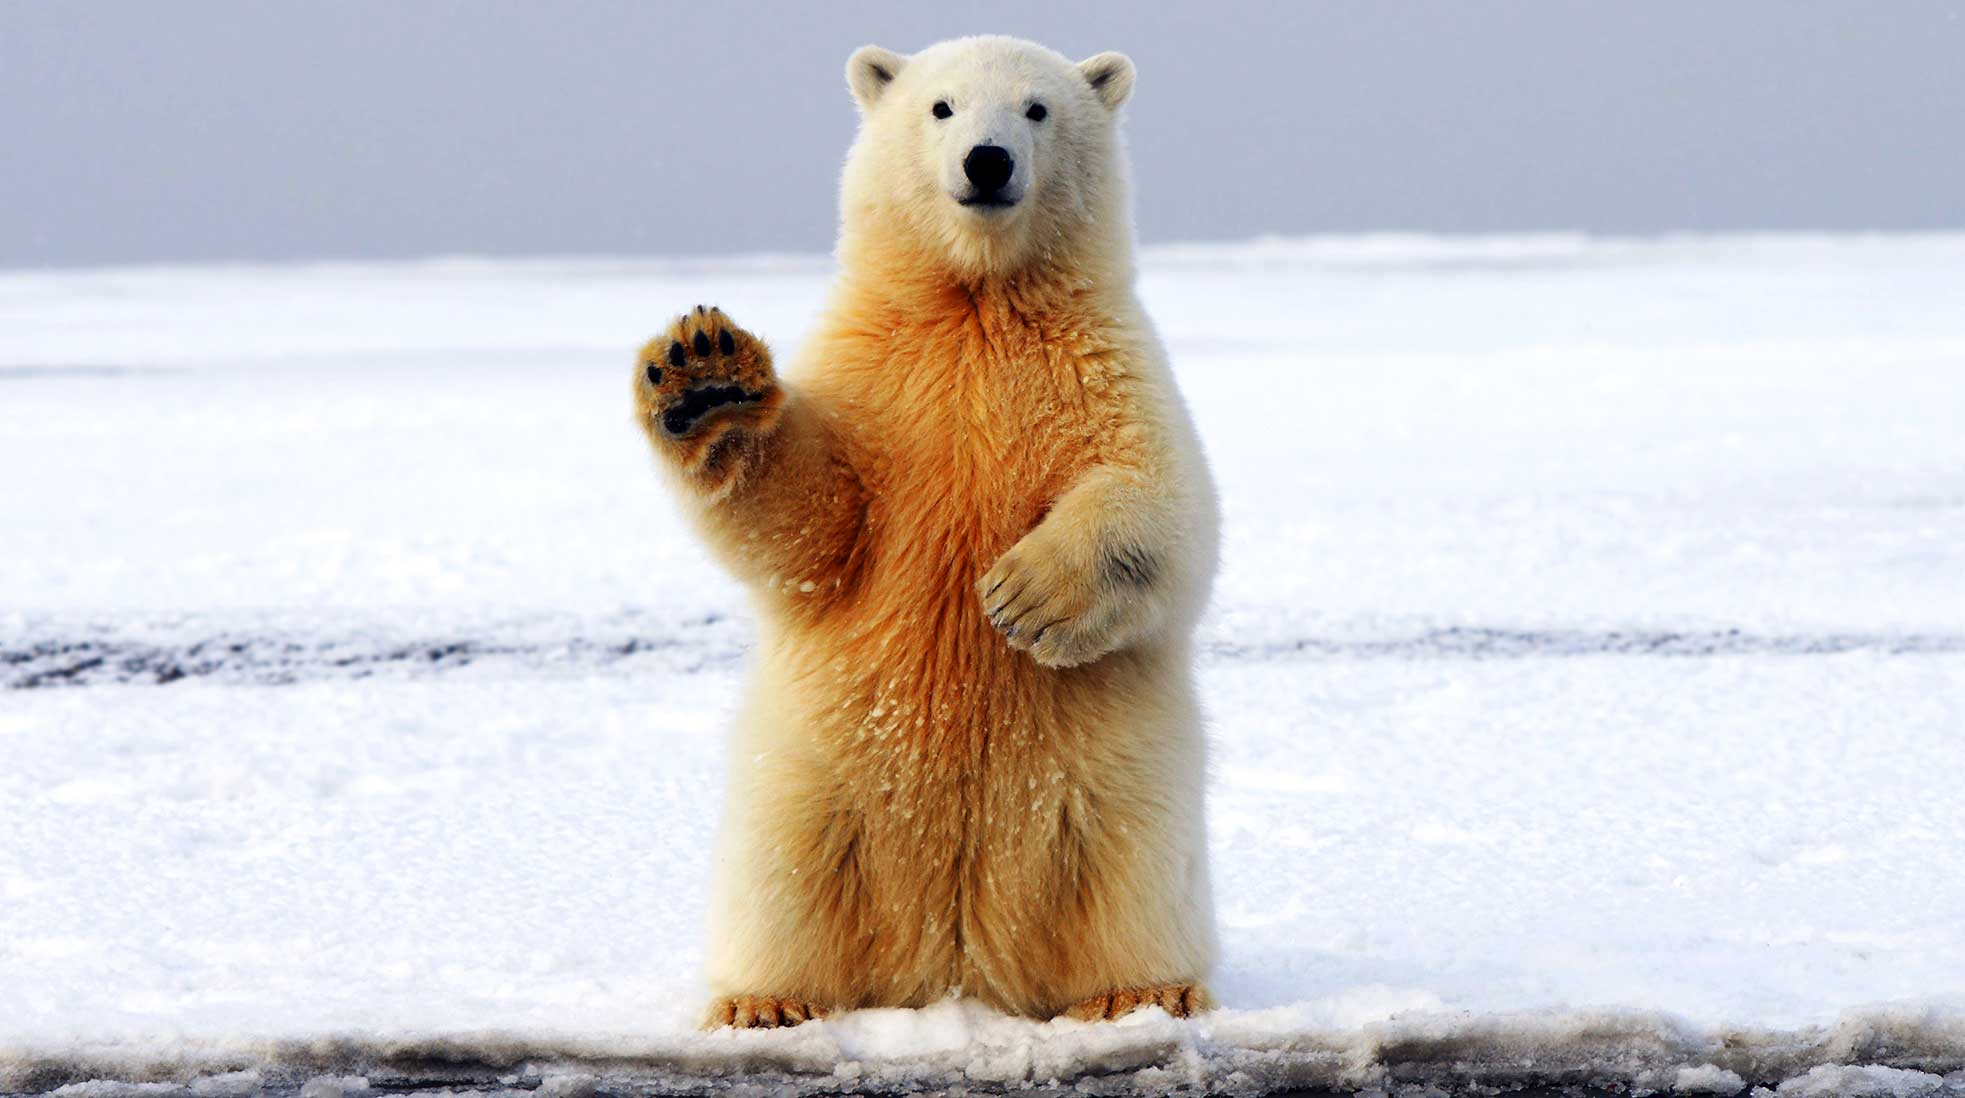 A polar bear says hi. Photo: Hans-Jurgen Mager / Unsplash